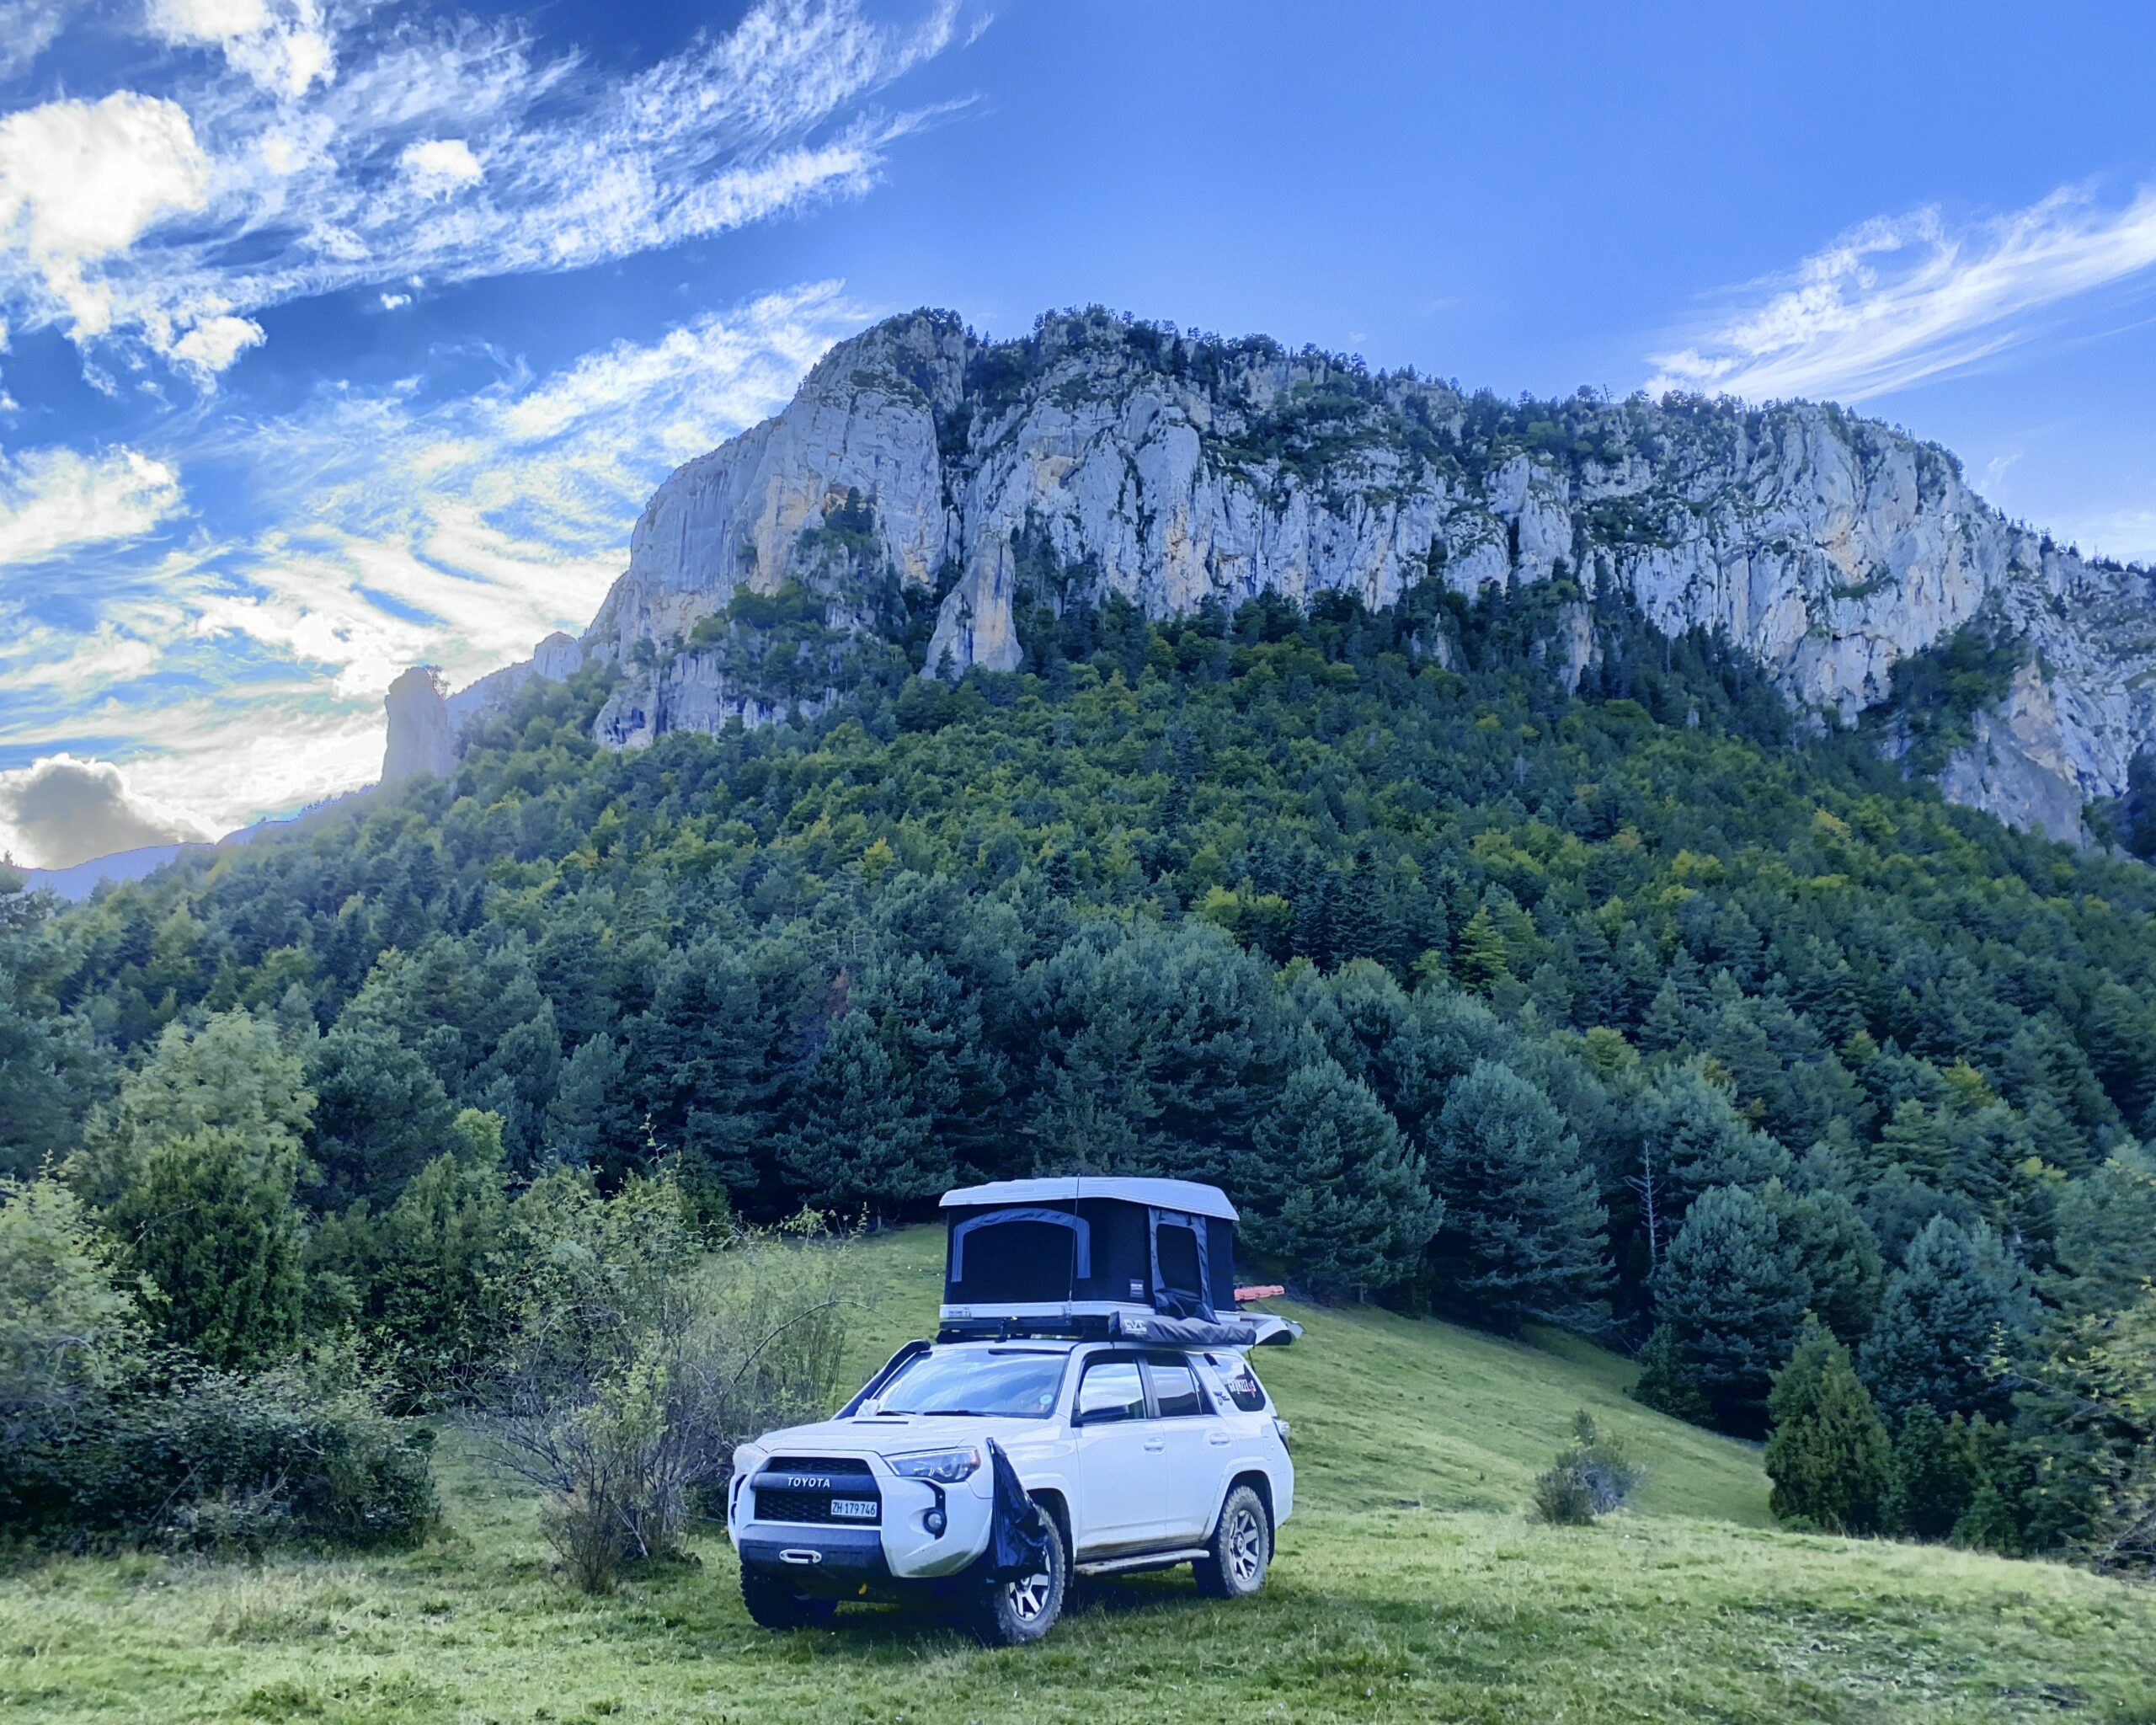 gebrauchtes Dachzelt: AUTOHOME Maggiolina GRAND TOUR 360°